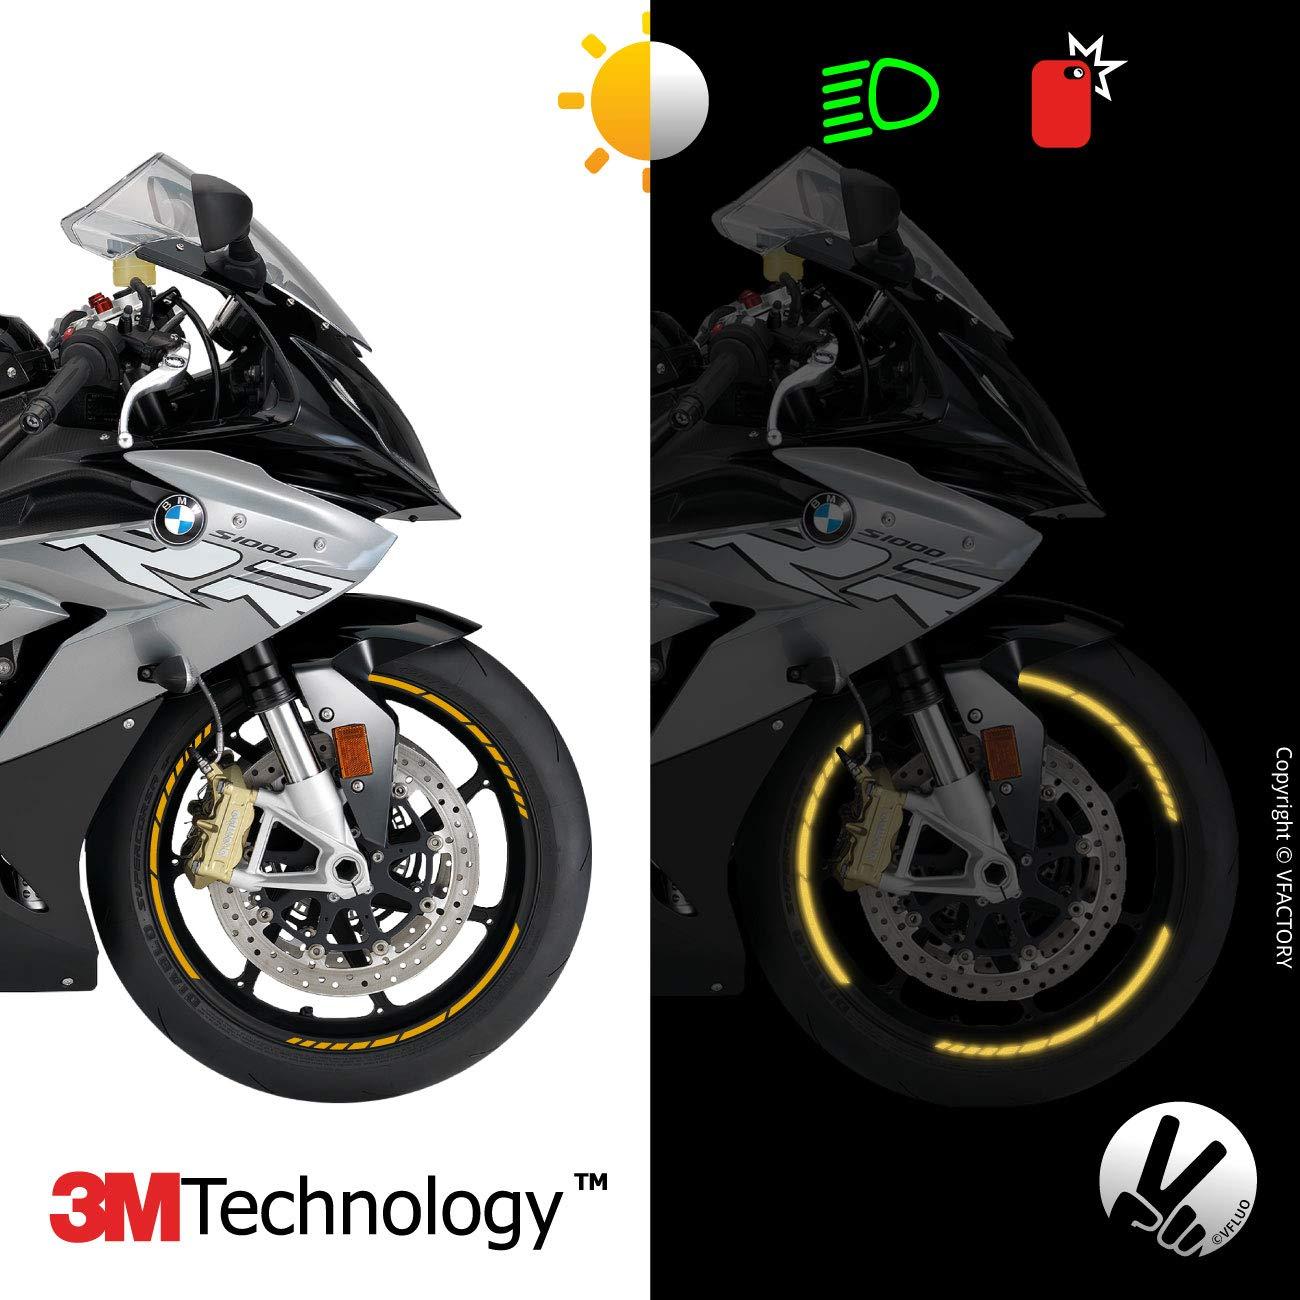 Kit de Cintas 3M Technology/™ Rayas Retro Reflectantes para Llantas de Moto Anchura Normal : 7mm 1 Rueda Blanco//Plata VFLUO GP Design/™